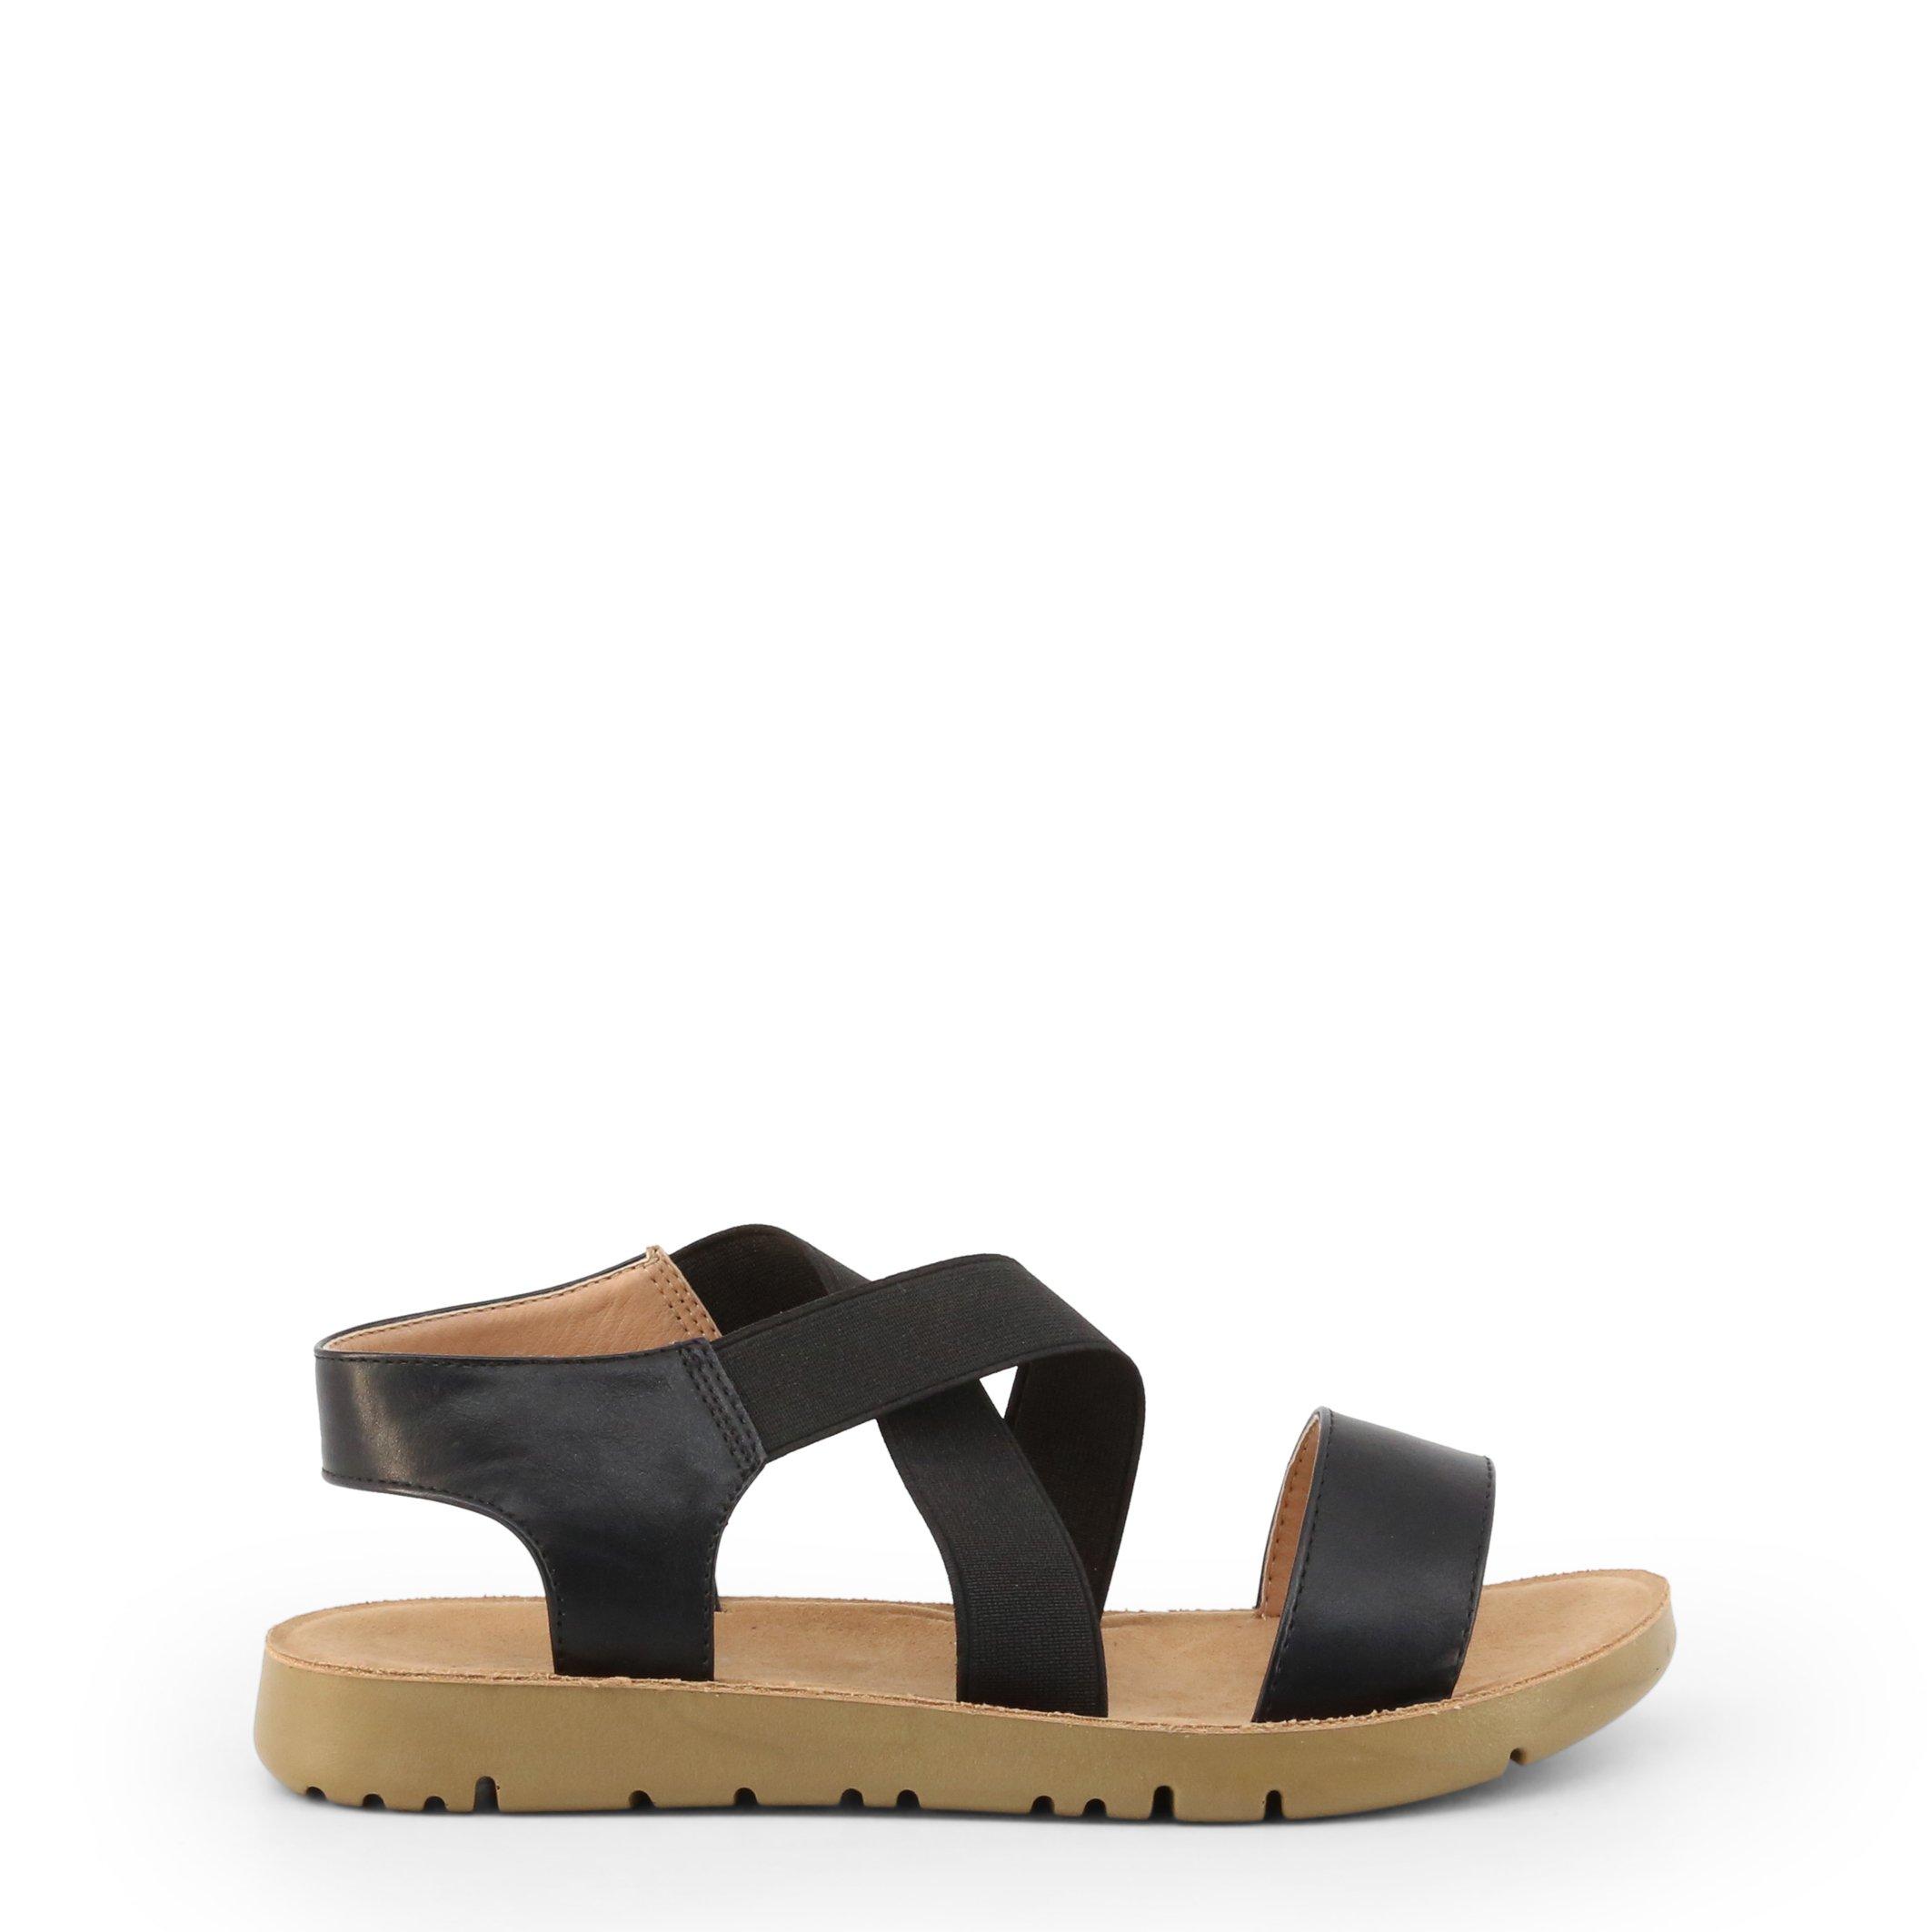 Roccobarocco Women's Sandal Various Colours RBSC1XY01 - black EU 36